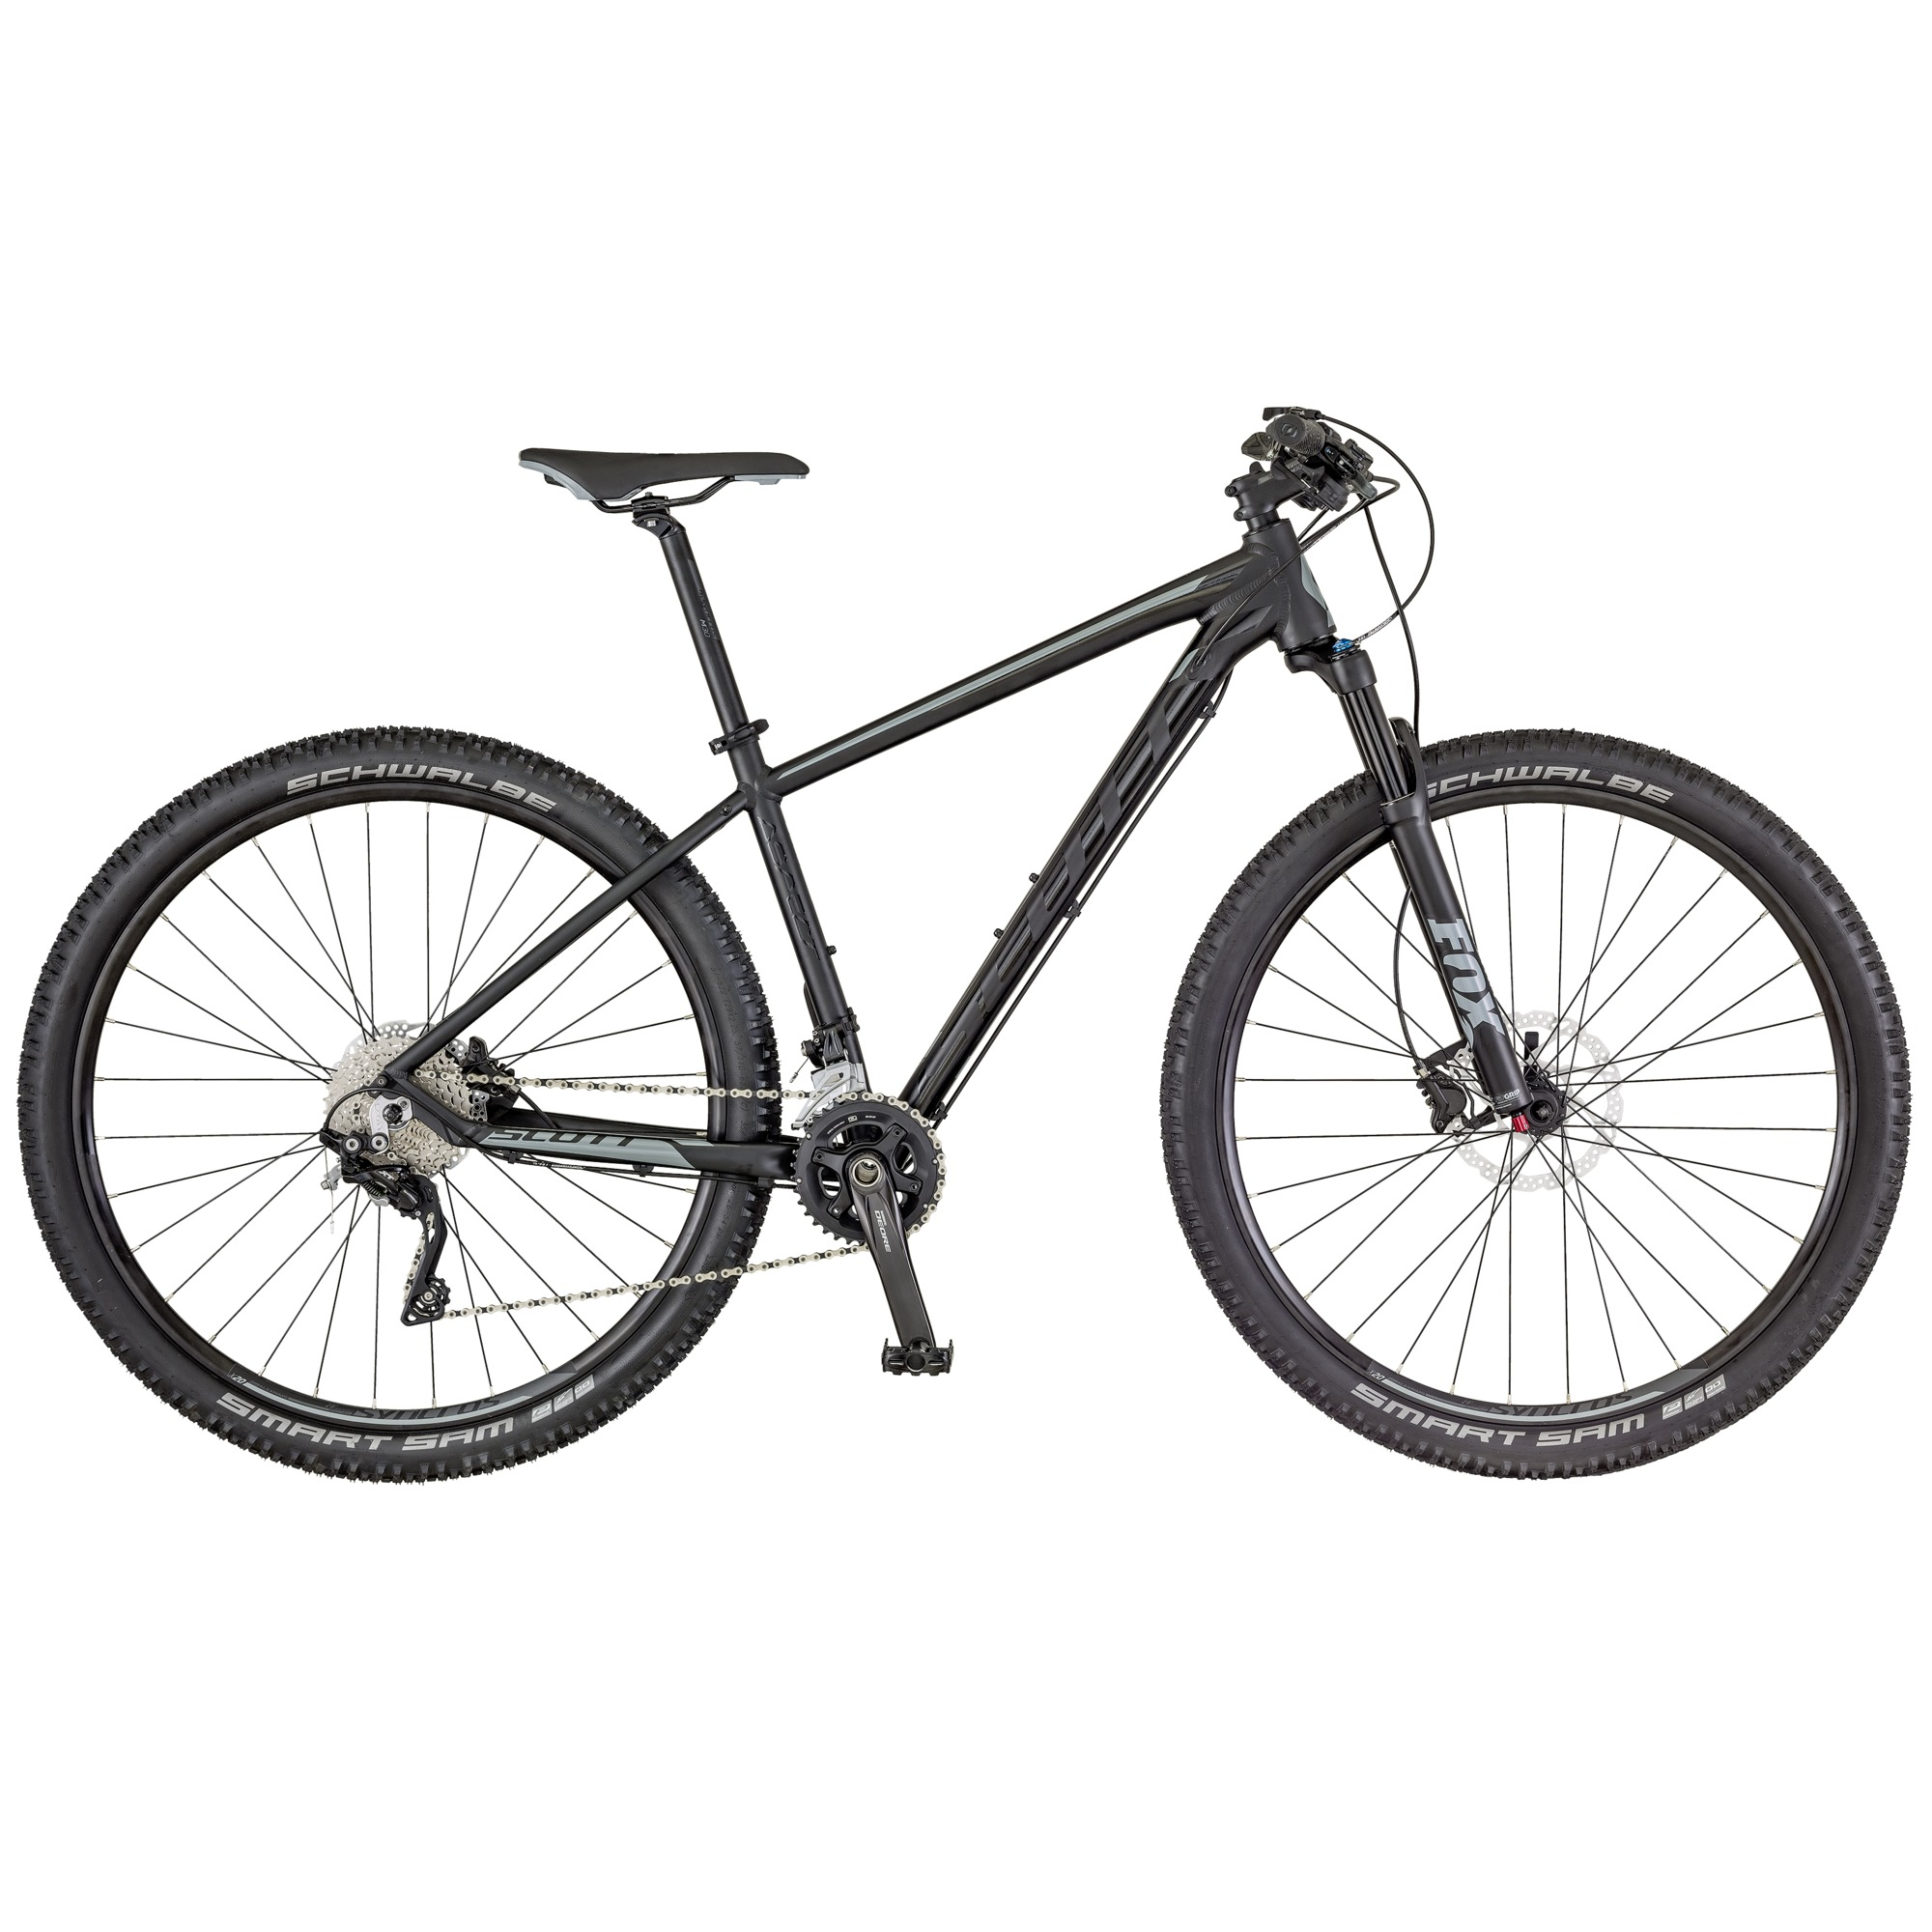 SCOTT Aspect 900 Bike L - Zweirad Homann